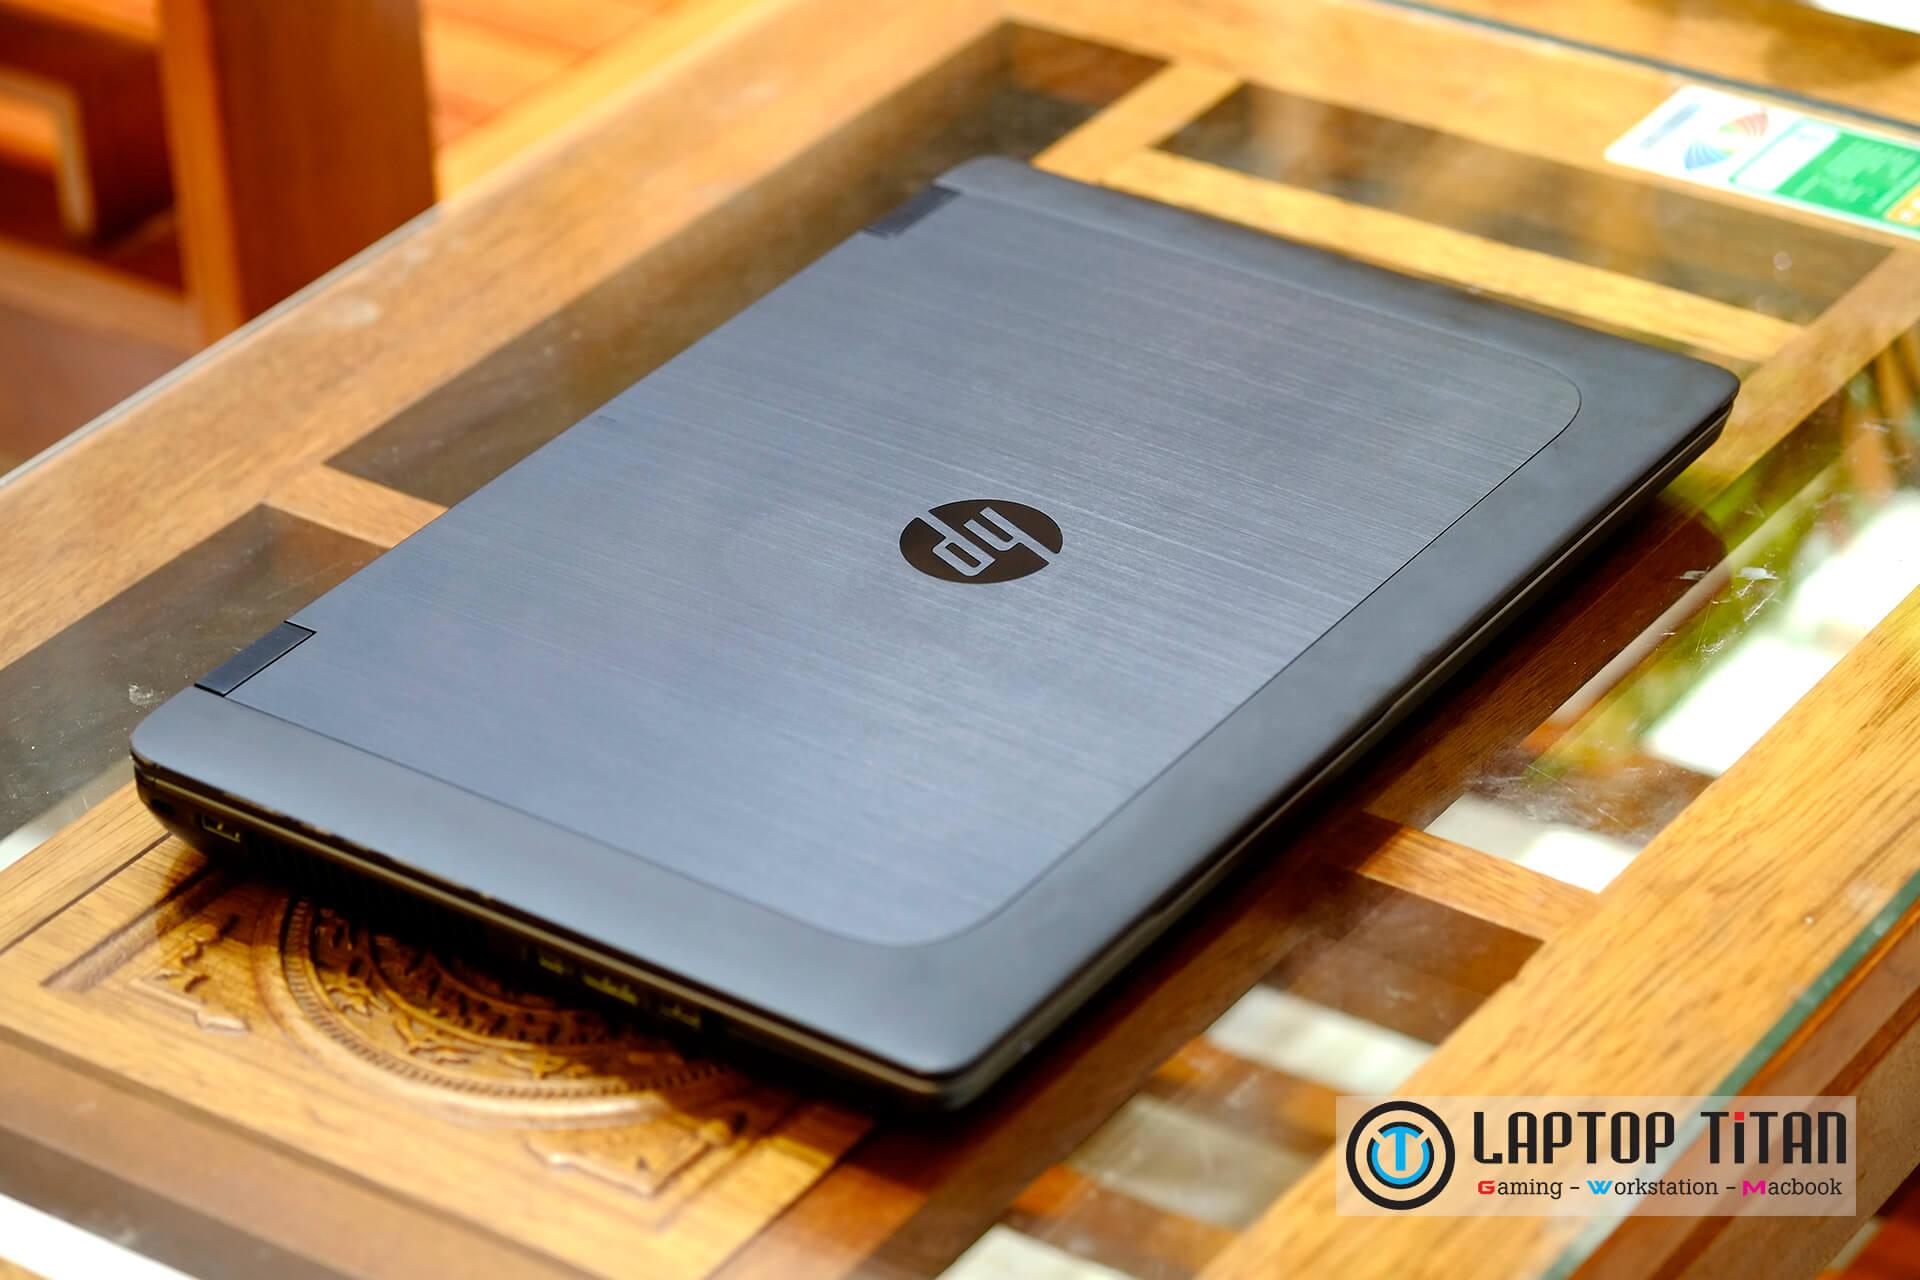 HP Zbook 15 G2 Core i7 4800MQ / 8GB / 128GB + 500GB / nVidia Quadro K1100M / 15.6-inch FHD